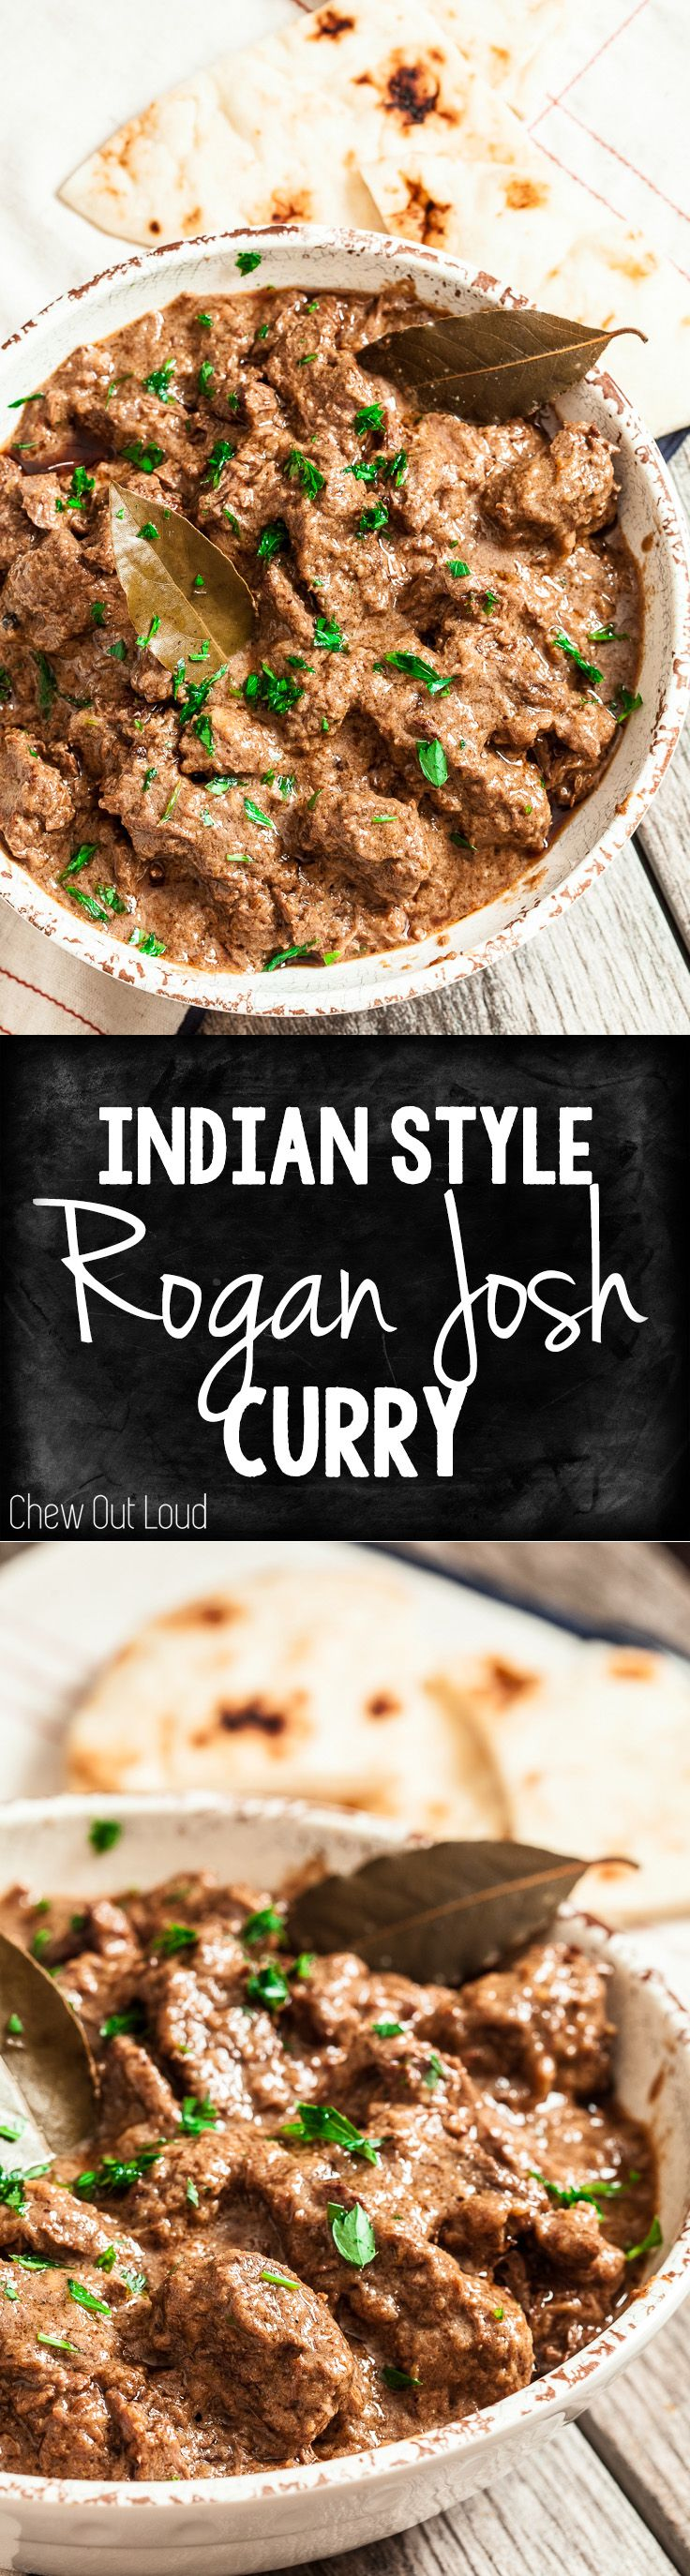 Indian Style Curry - Rogan Josh is the real deal. Perfect with basmati rice & naan bread. Soooo good.